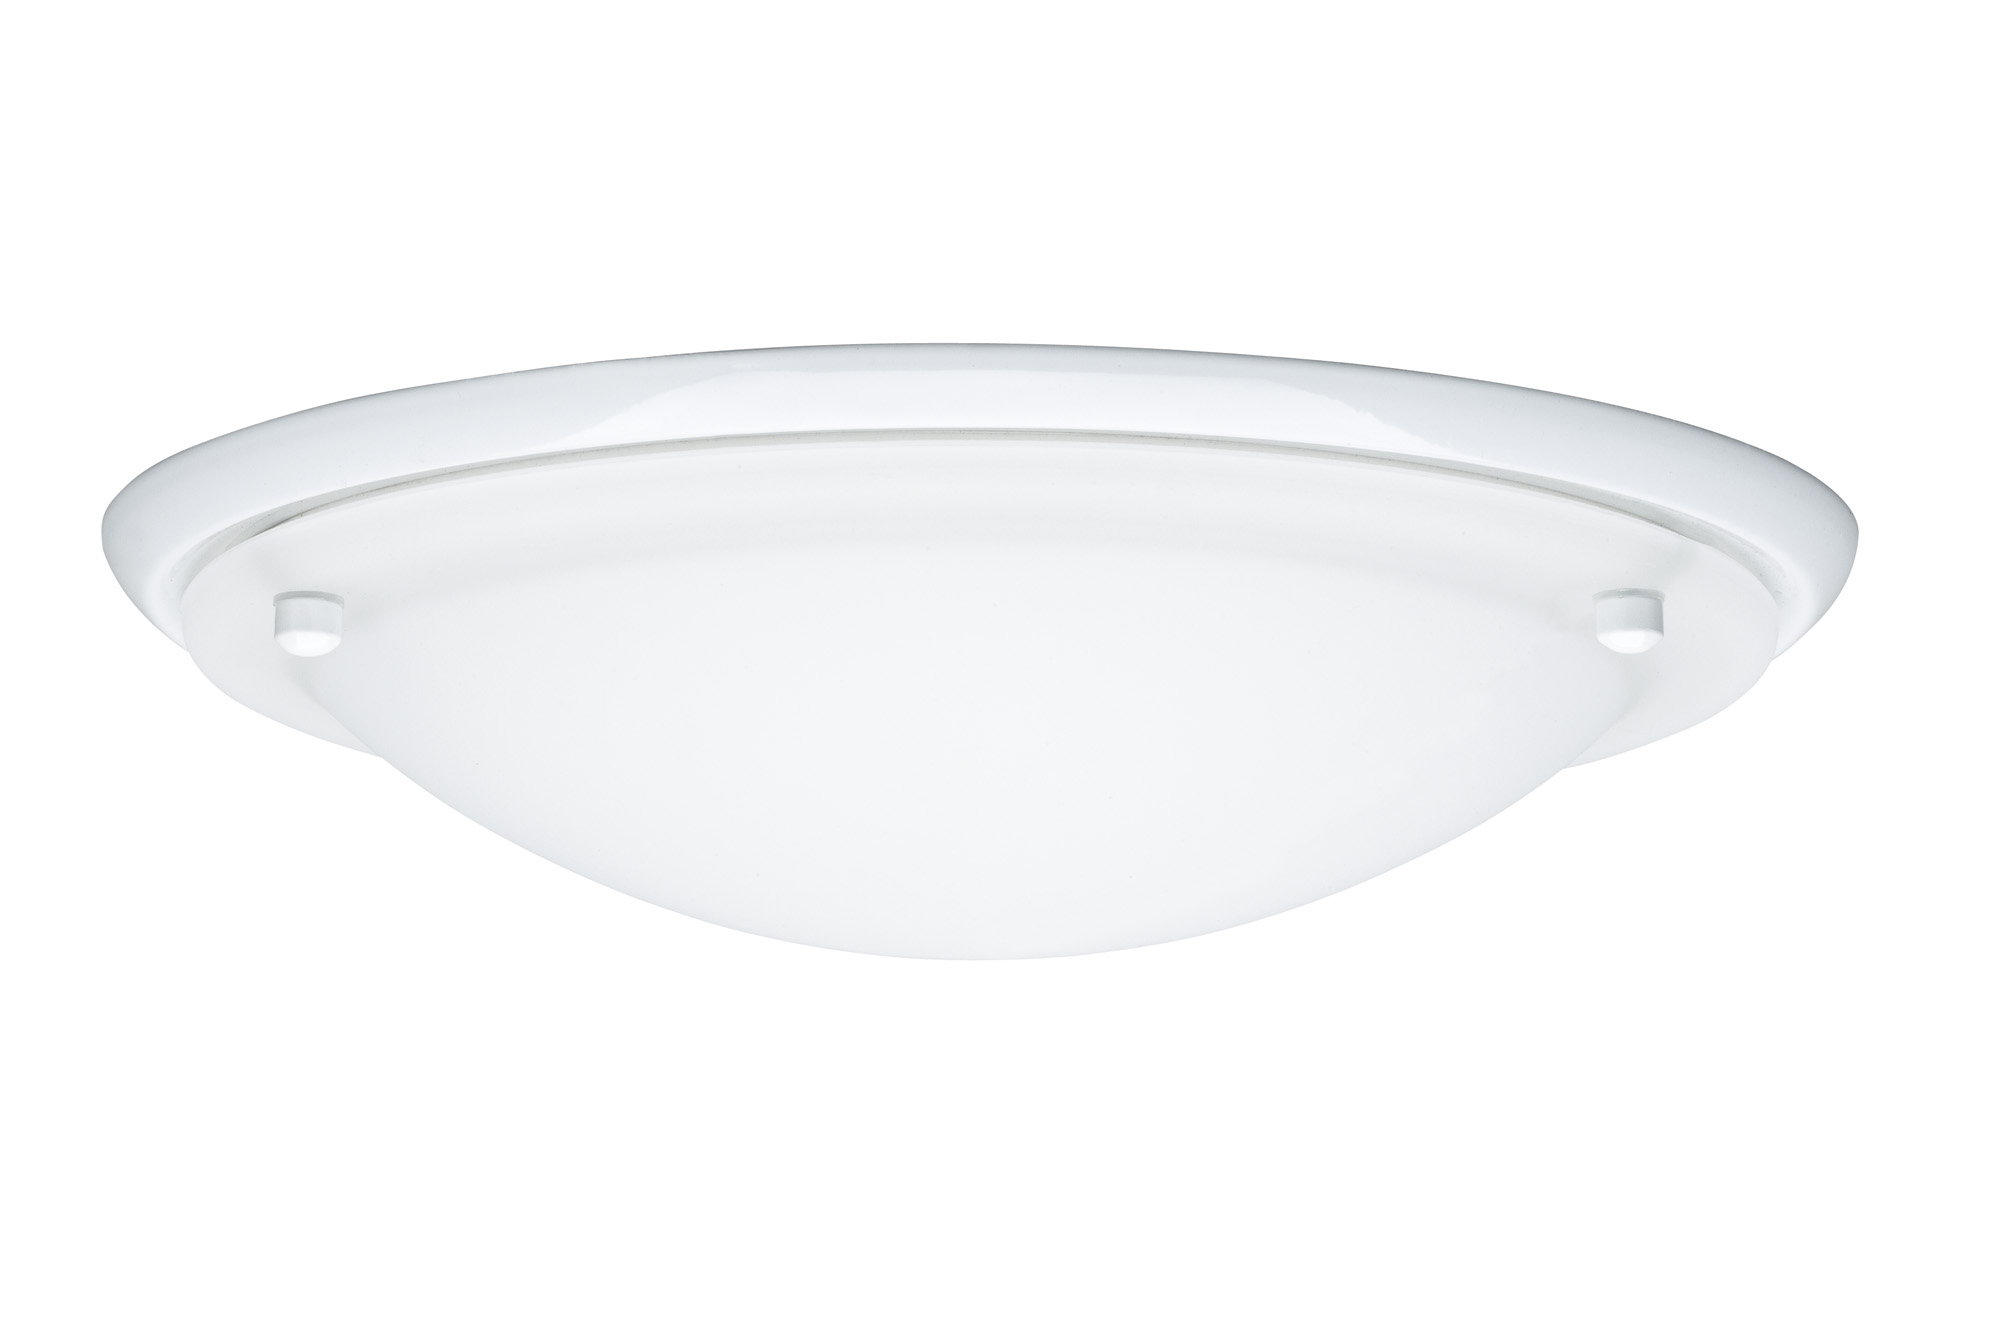 Plafonnier salle de bain design for Luminaire classe 2 salle de bain